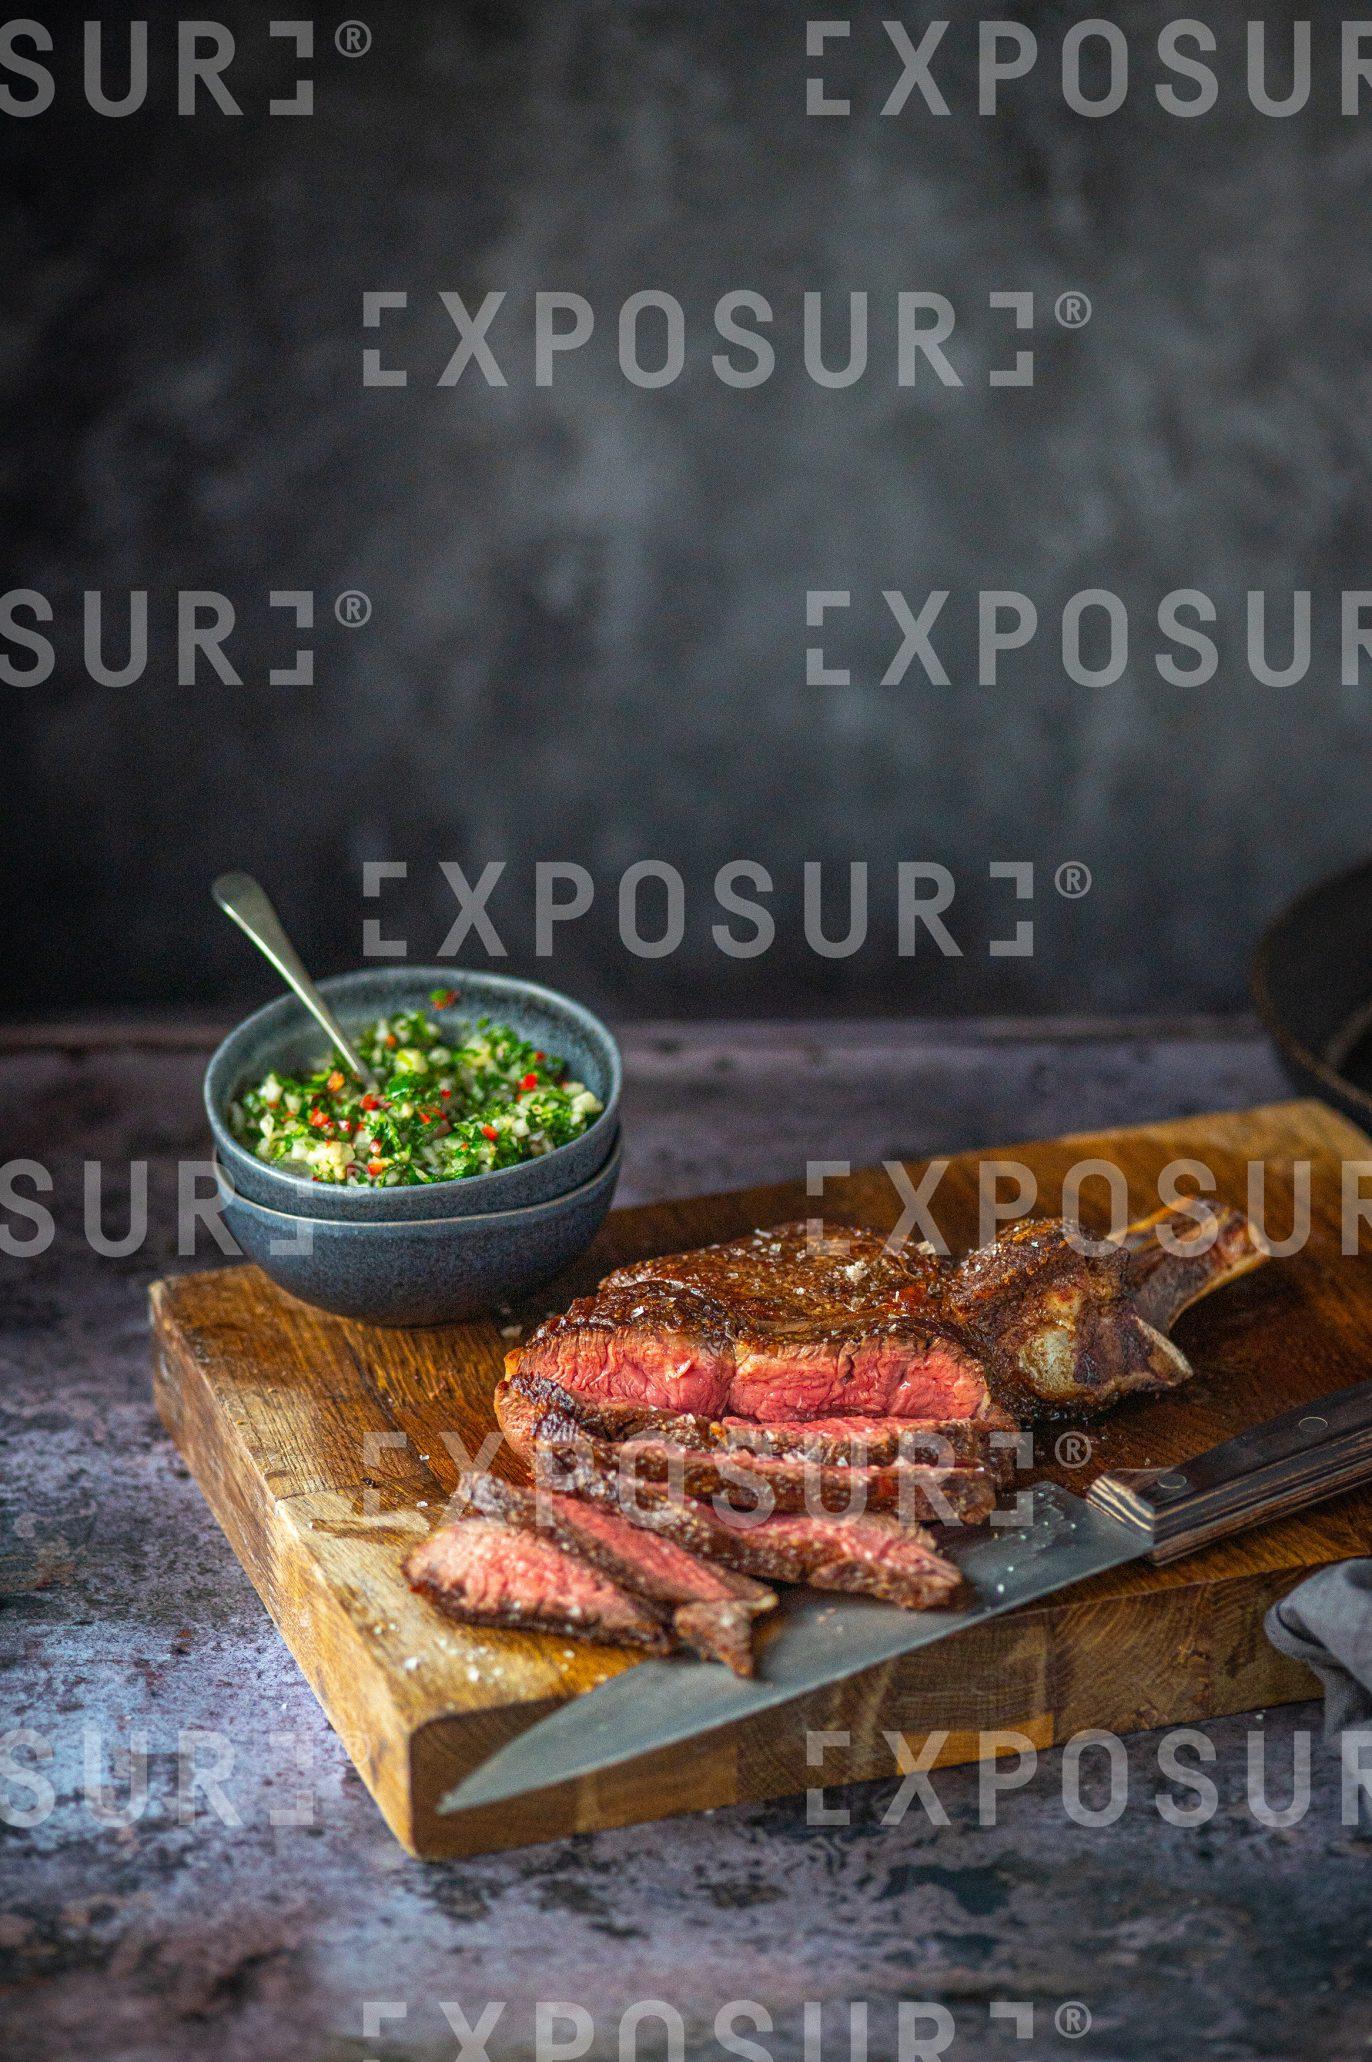 Medium-rare steak and chimichurri sauce